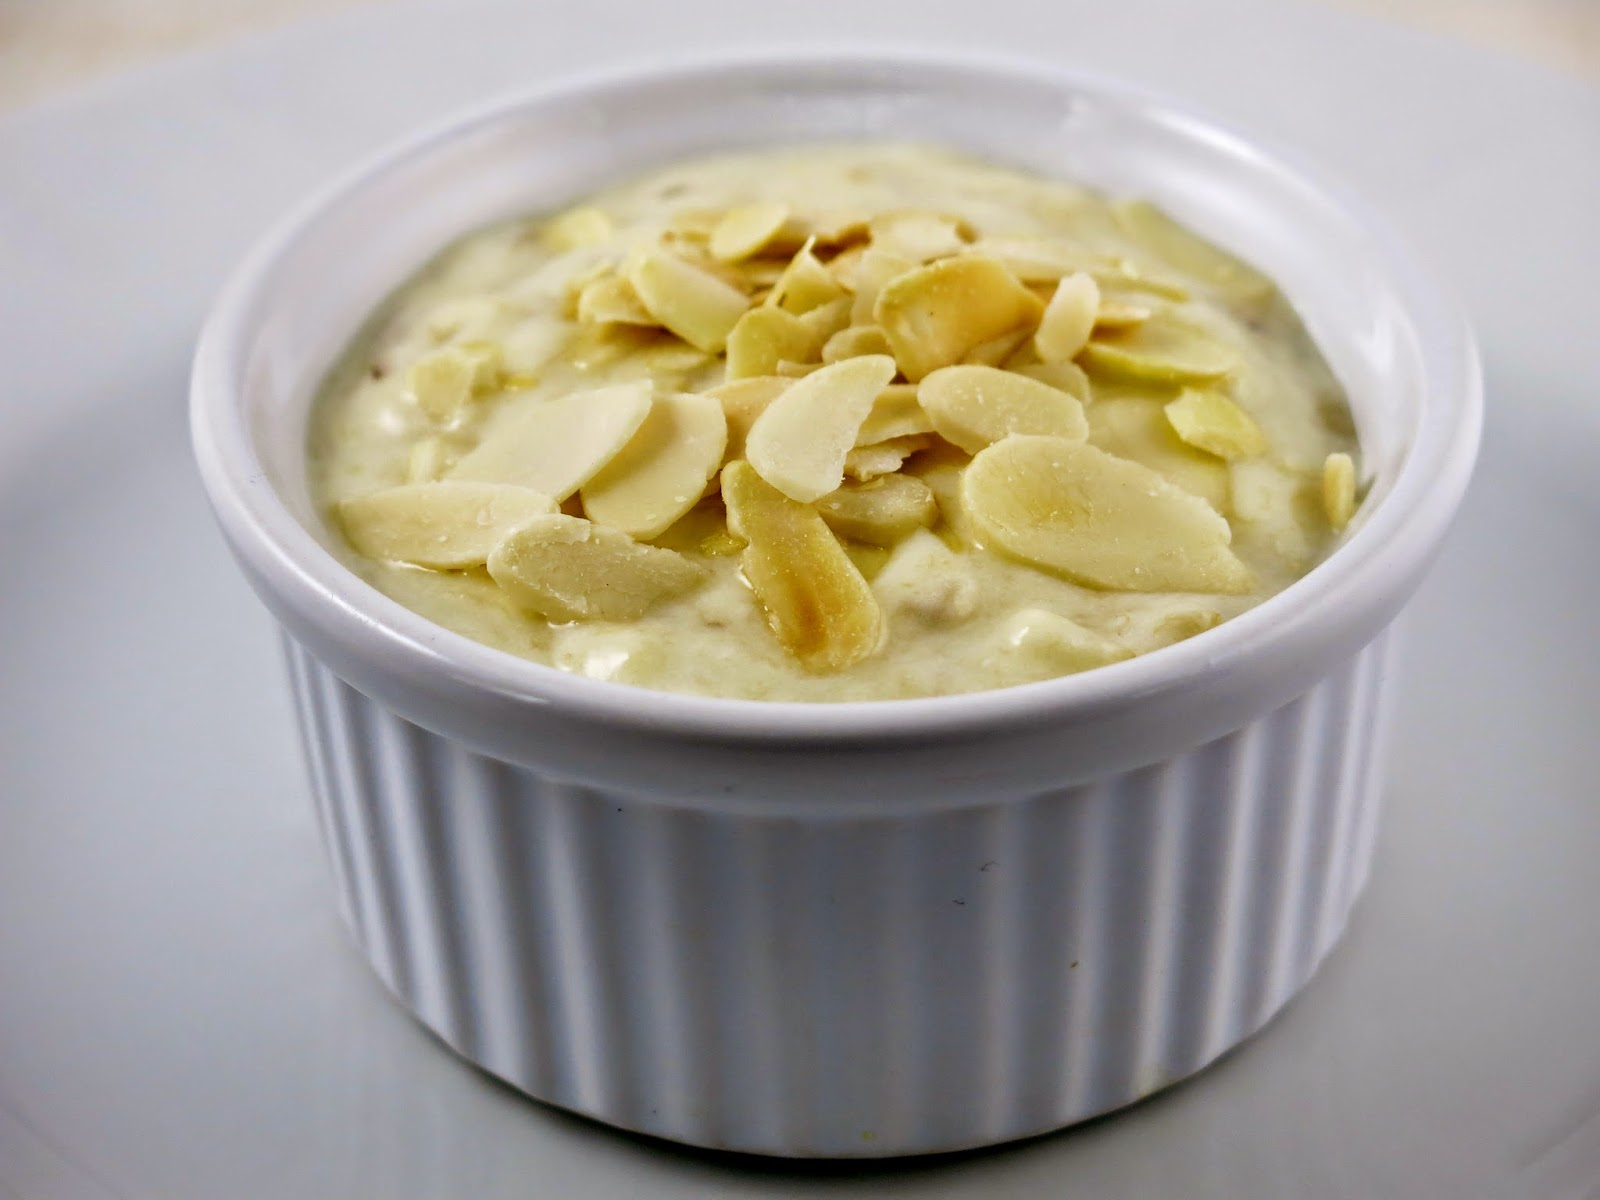 http://carrotcake.fr/fr/recipes/creme-a-la-banane